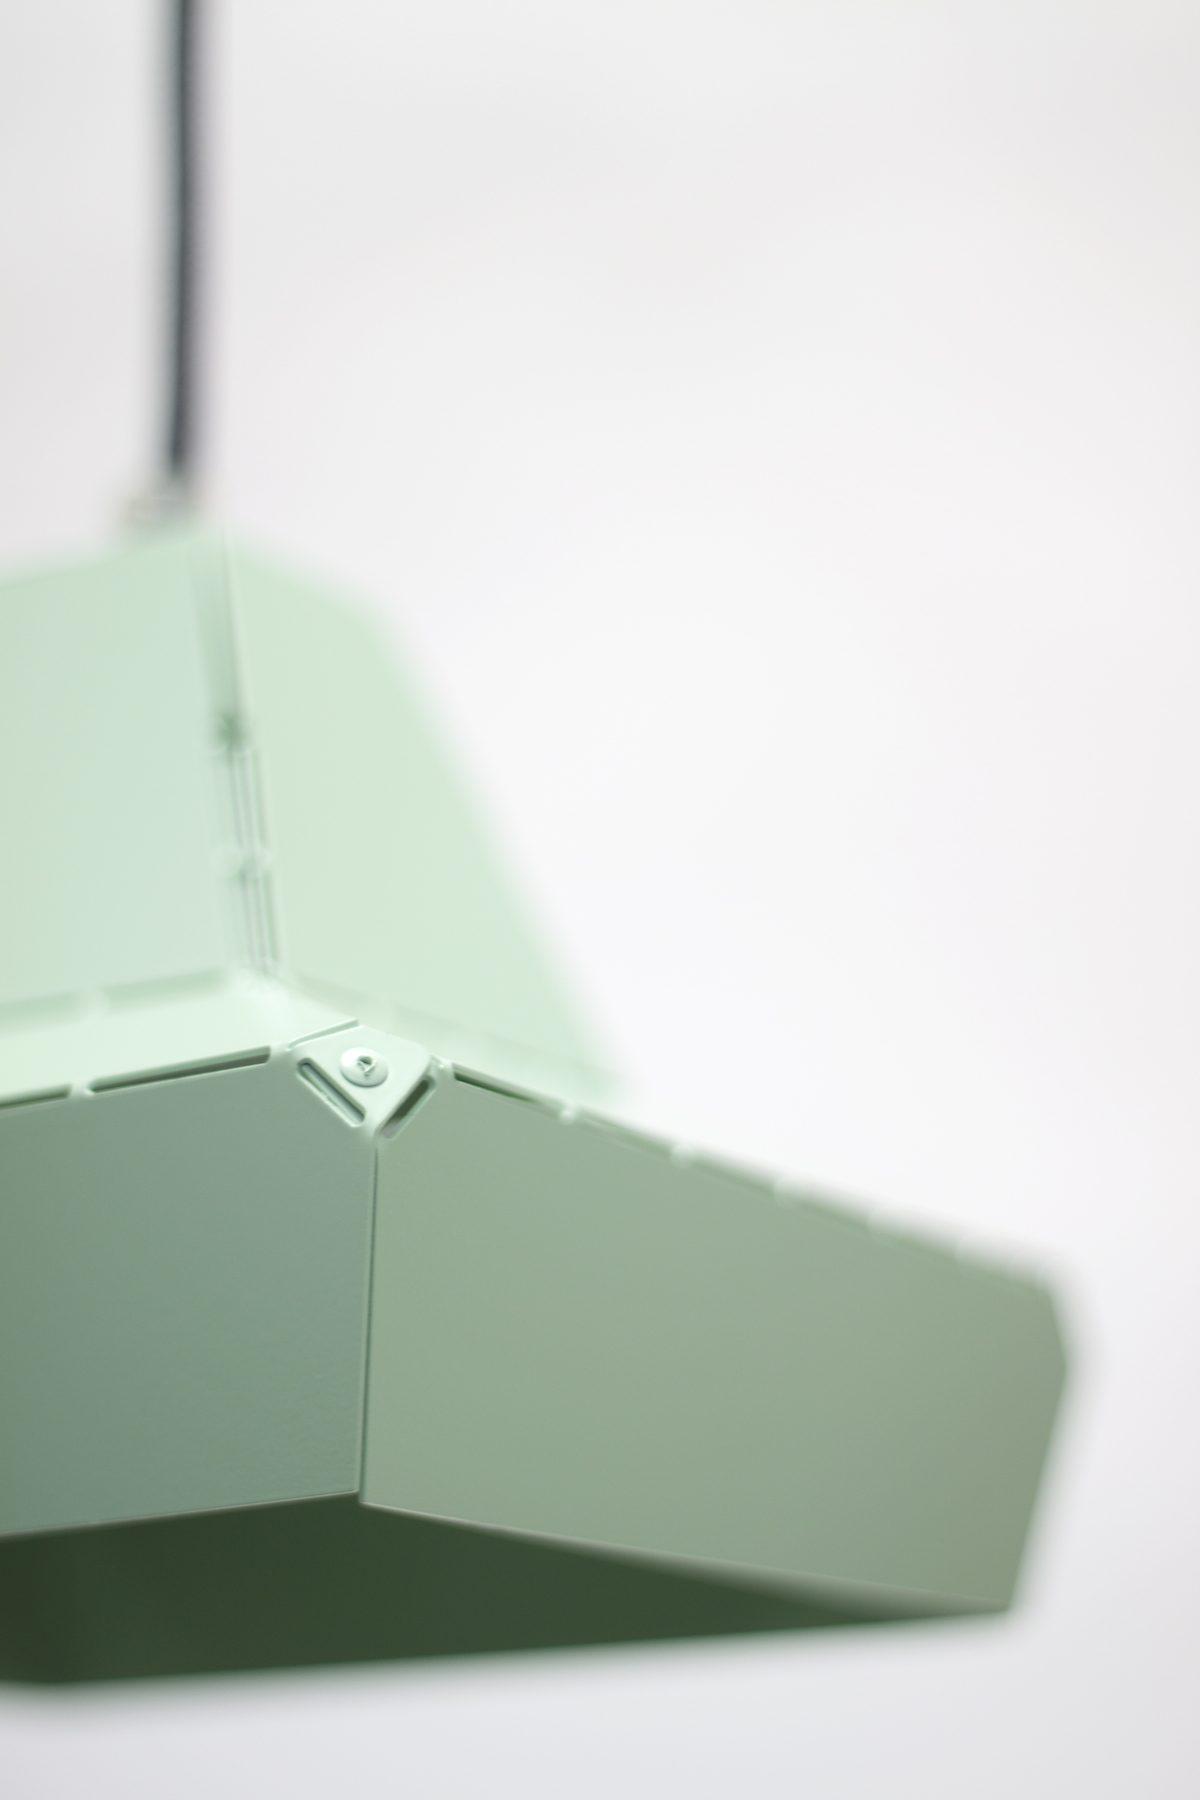 DashedLights 16cm white green detail label Vij5